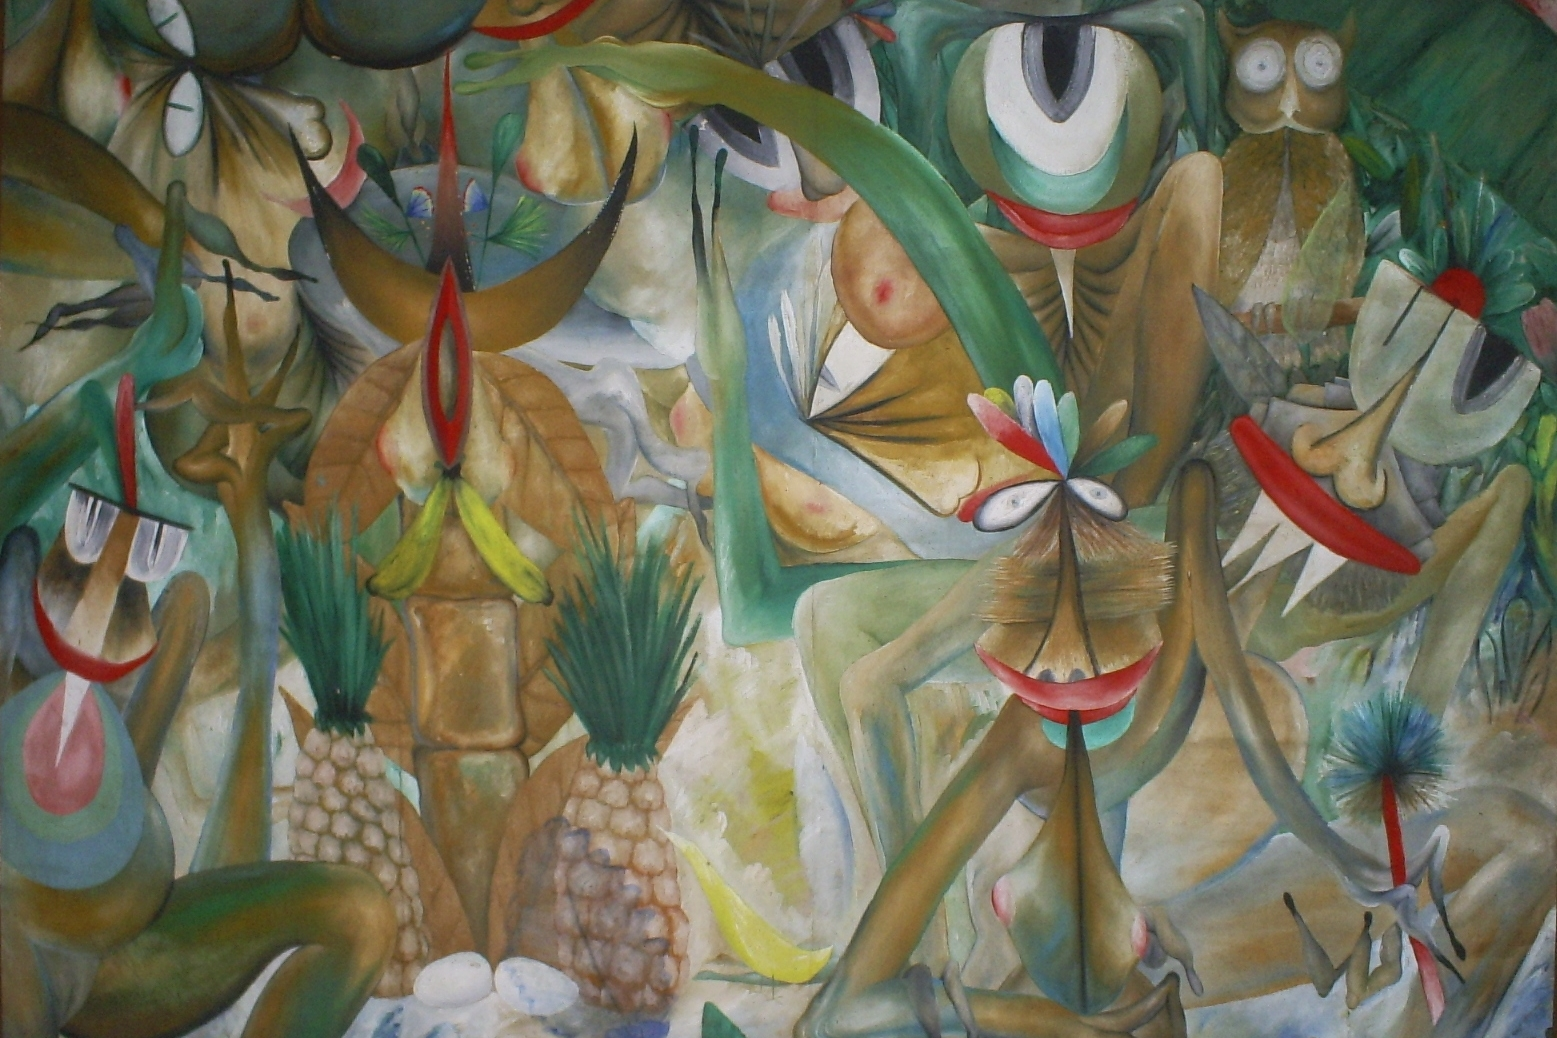 DRAPETOMANÍA: GRUPO ANTILLANO AND THE ART OF AFRO-CUBA - March 7, 2014 - July 18, 2014